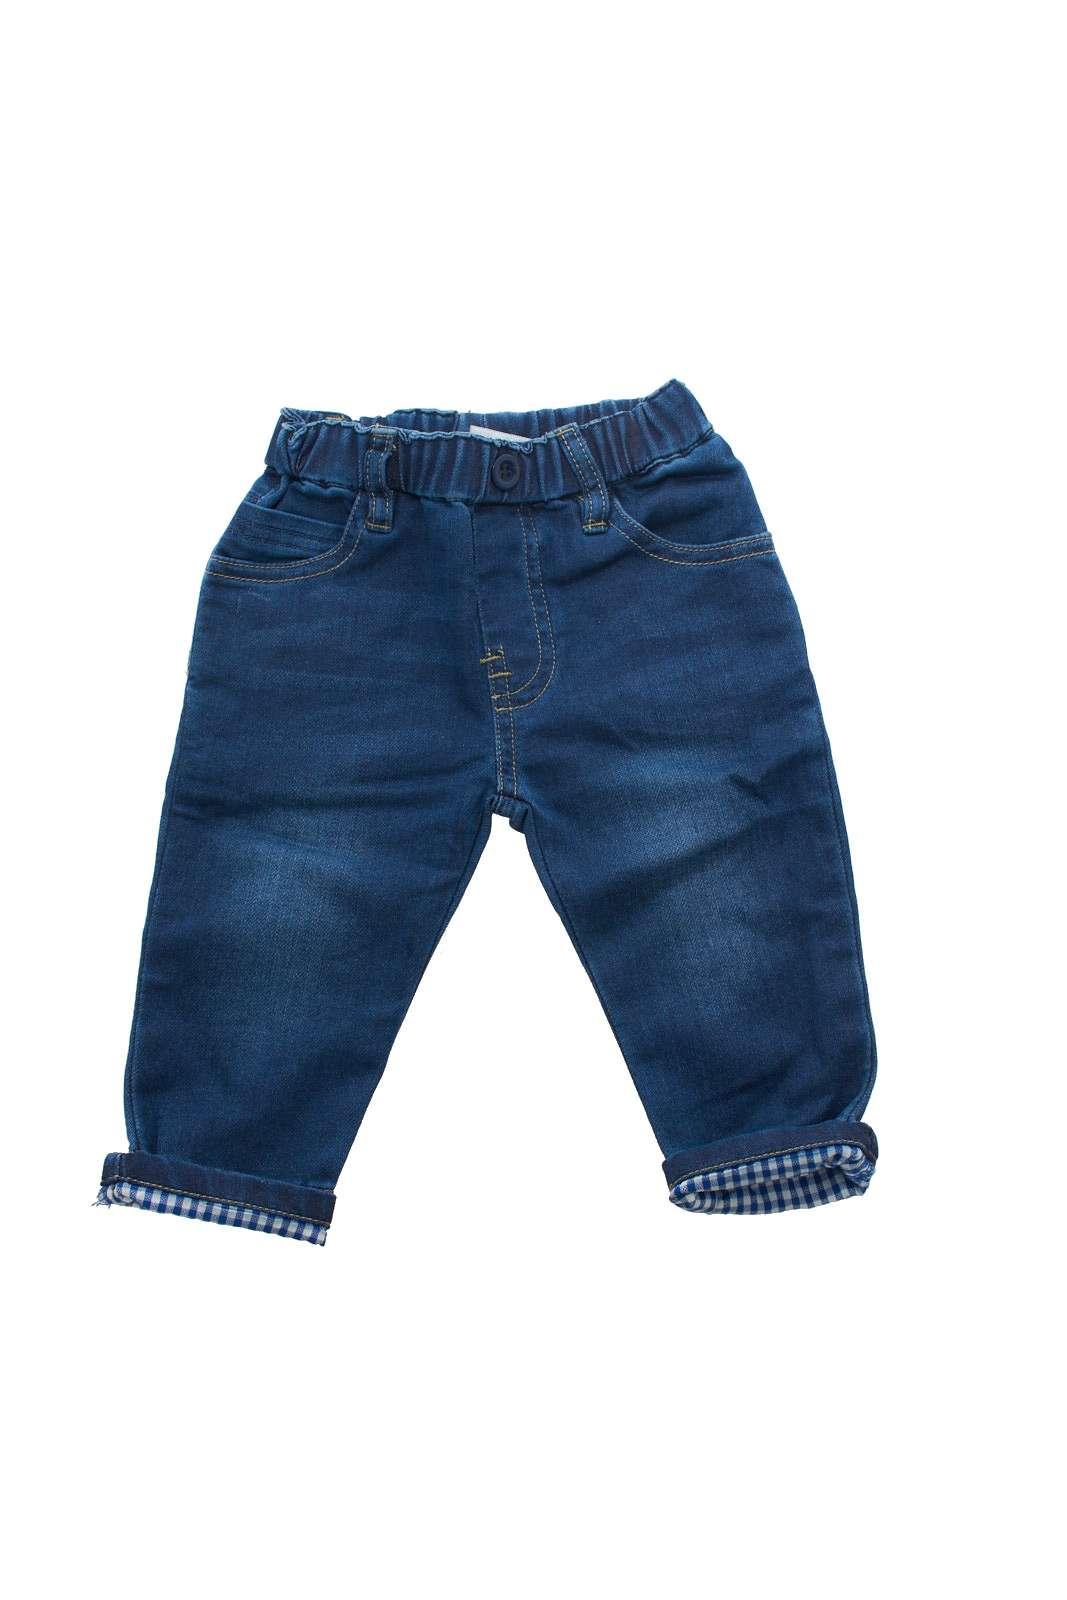 https://www.parmax.com/media/catalog/product/a/i/PE-outlet_parmax-pantaloni-bambino-Fun-e-Fun-21022020-A.jpg